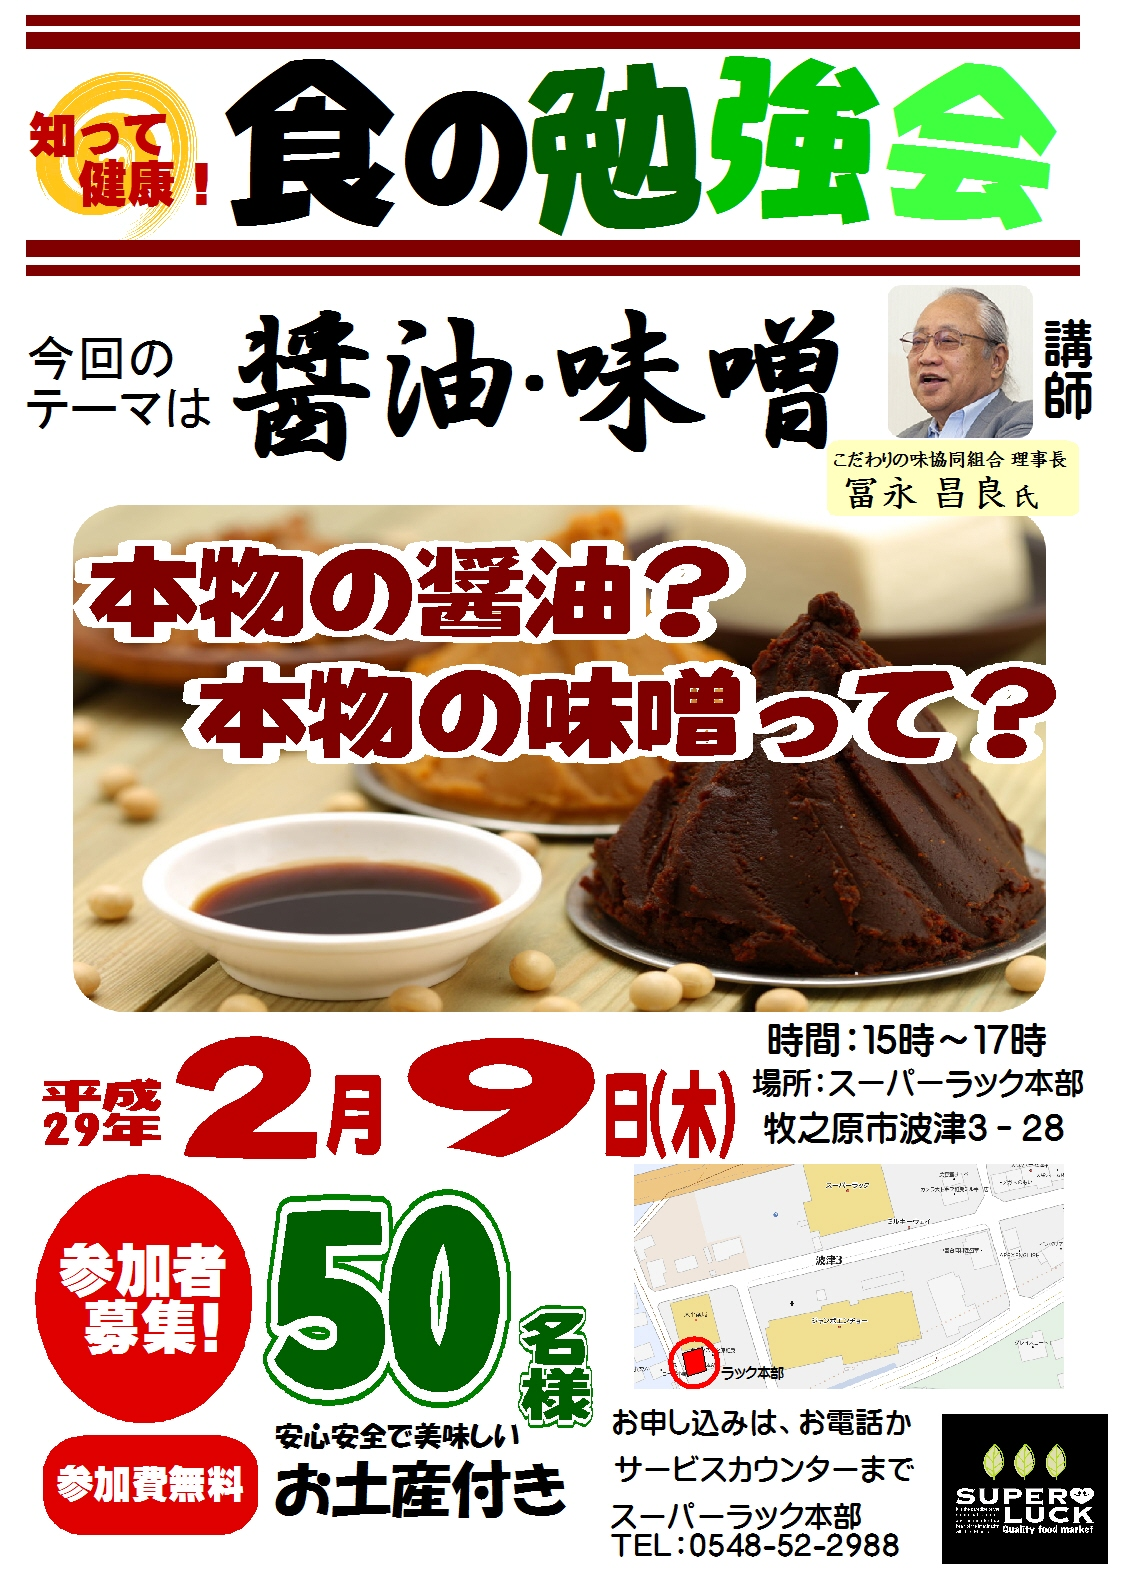 食の勉強会醤油・味噌